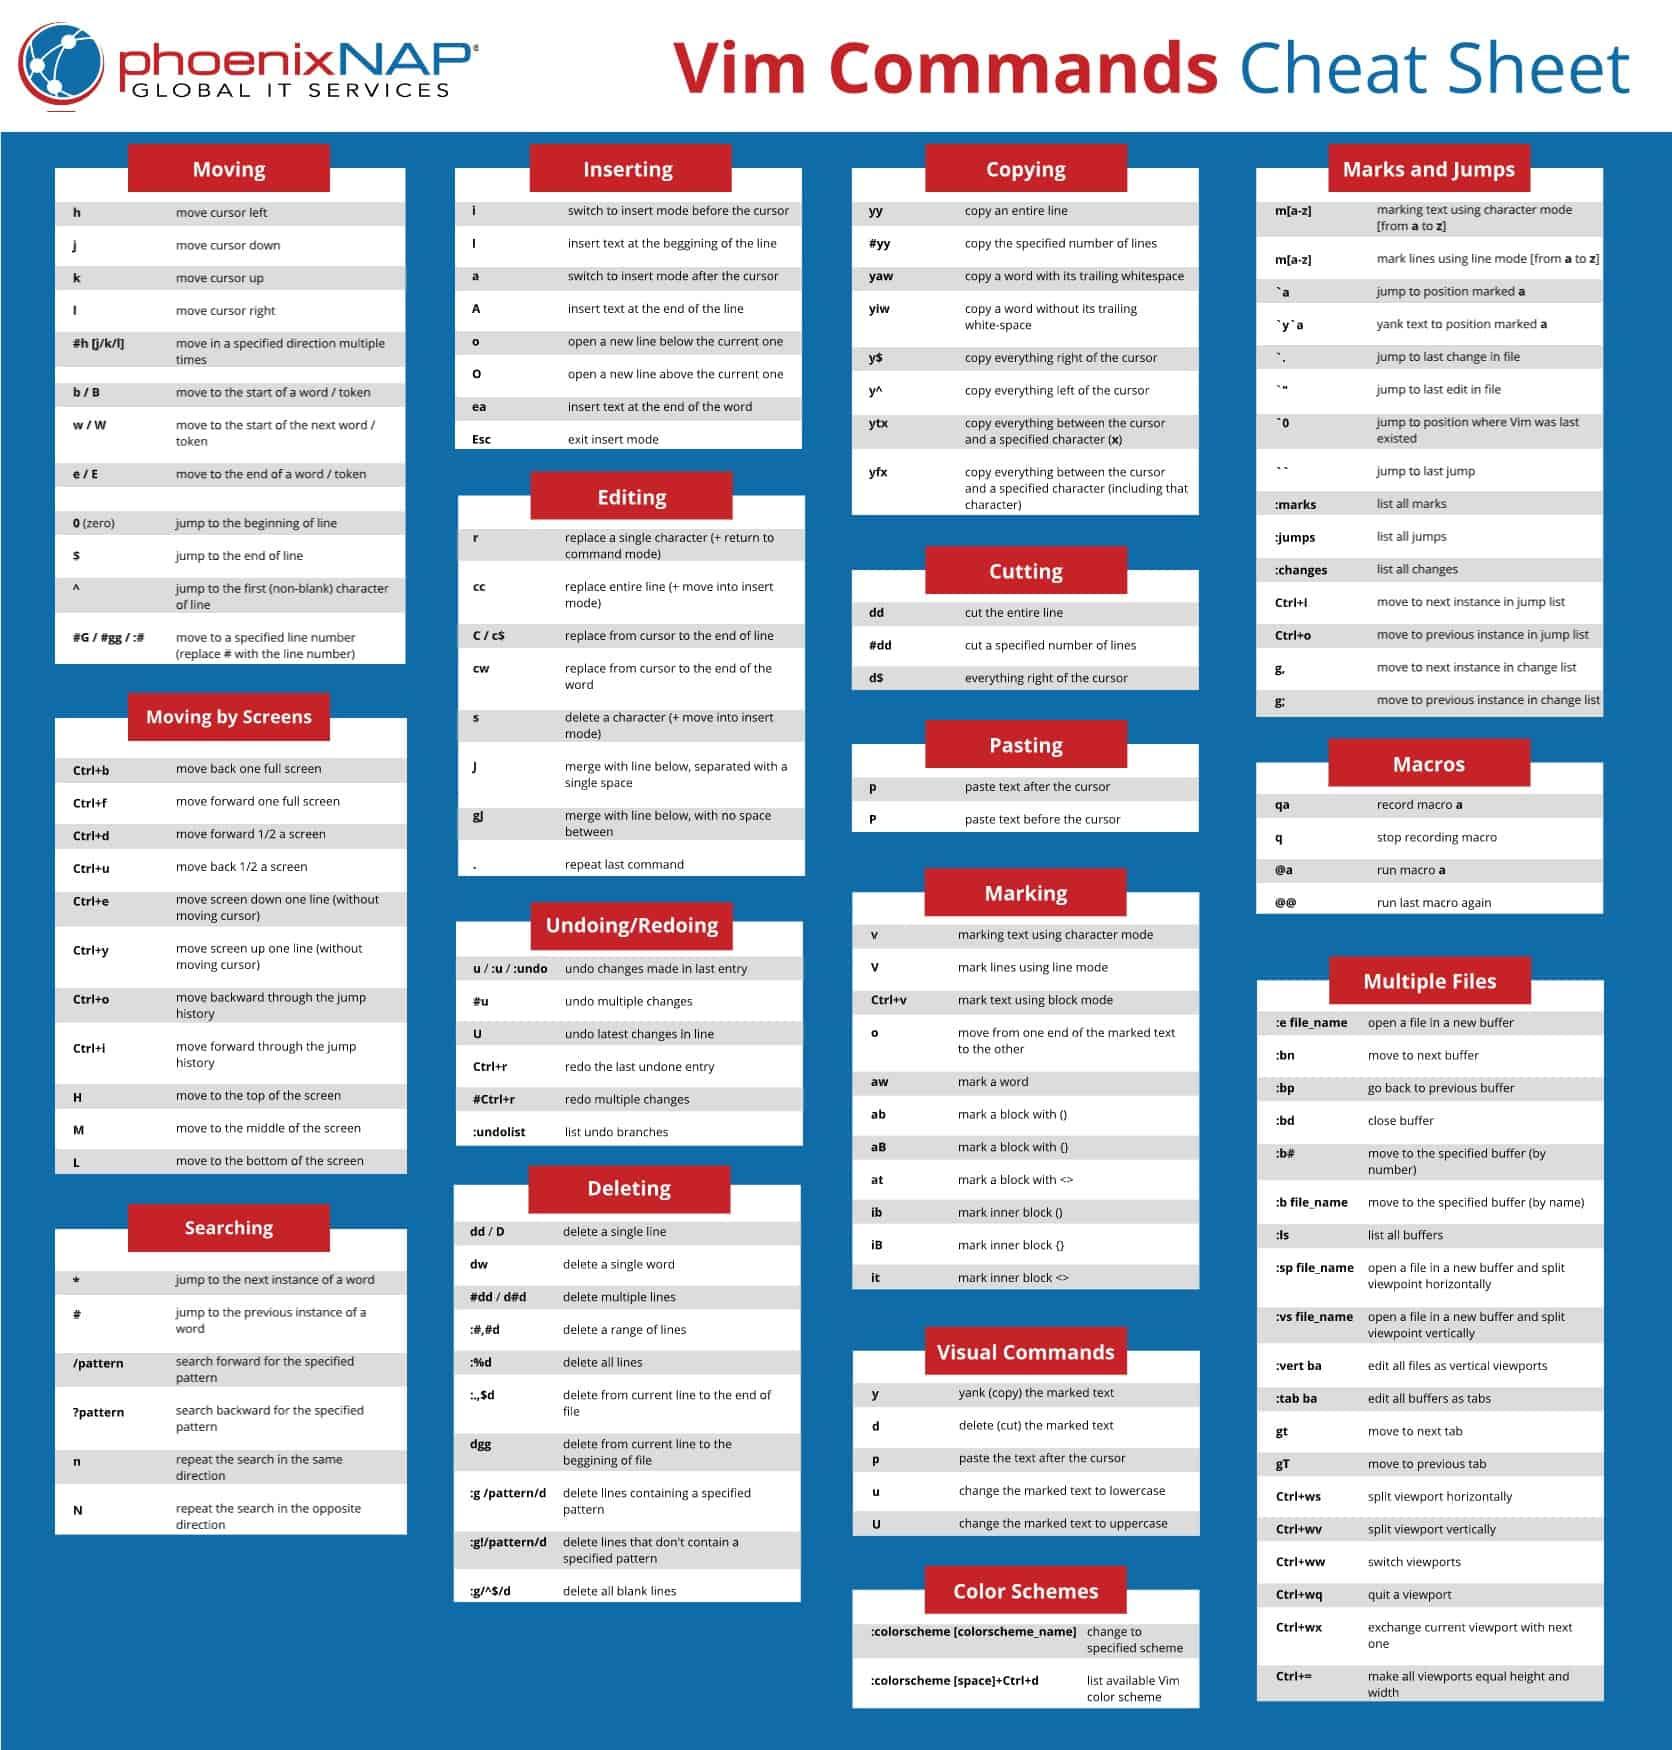 Vim commands cheat sheet.